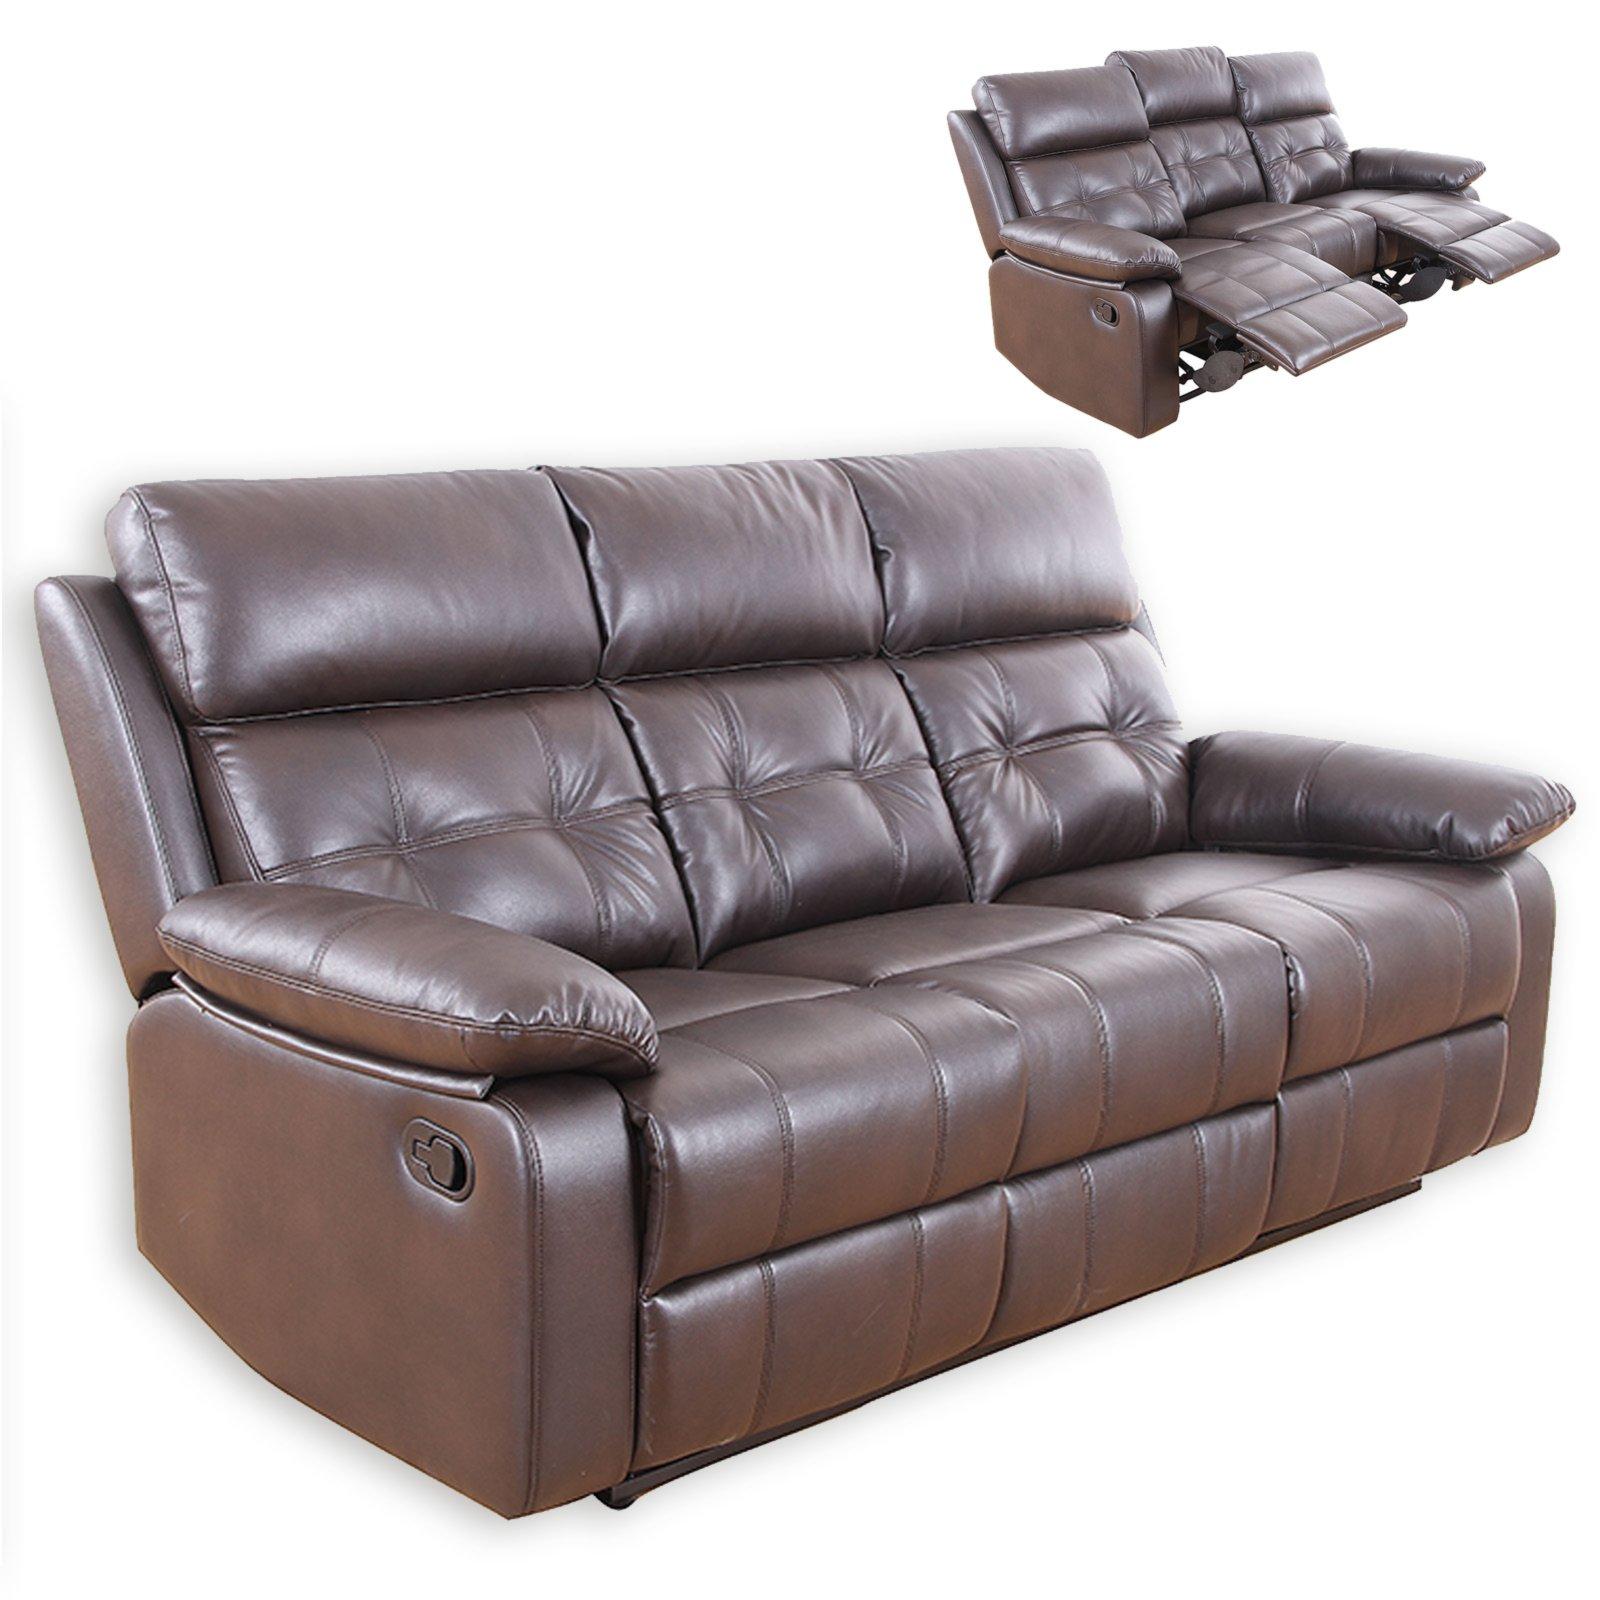 sofa couch online bestellen interio fifty nine bettsofa 3-sitzer - dunkelbraun kunstleder relaxfunktion ...